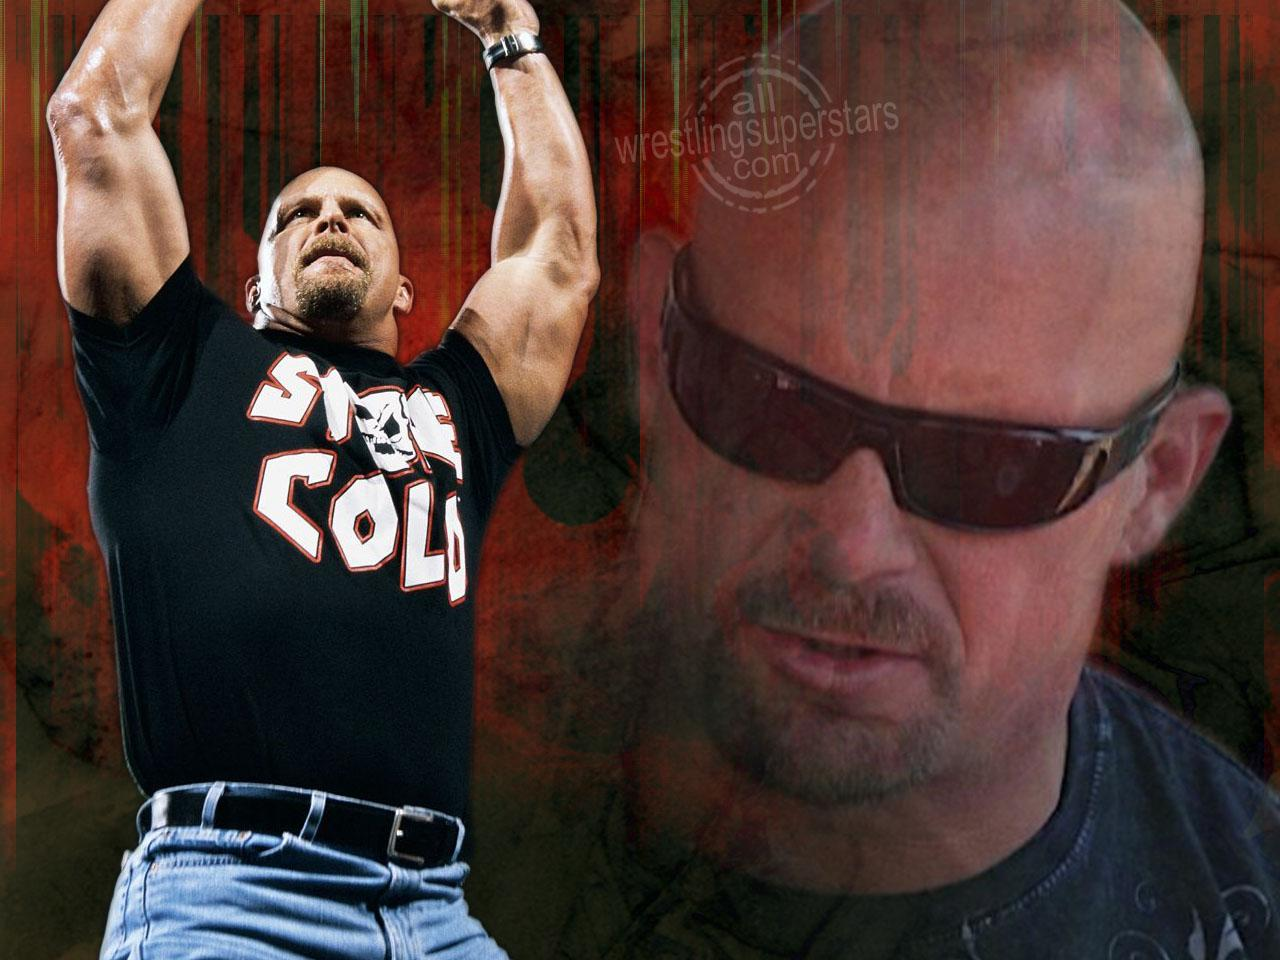 http://2.bp.blogspot.com/-AehtKUqhM5I/TgBOQkLRwTI/AAAAAAAABY0/SKs1DzXRIwg/s1600/WWE-WALLPAPERS-STEVE-AUSTIN-9.JPG